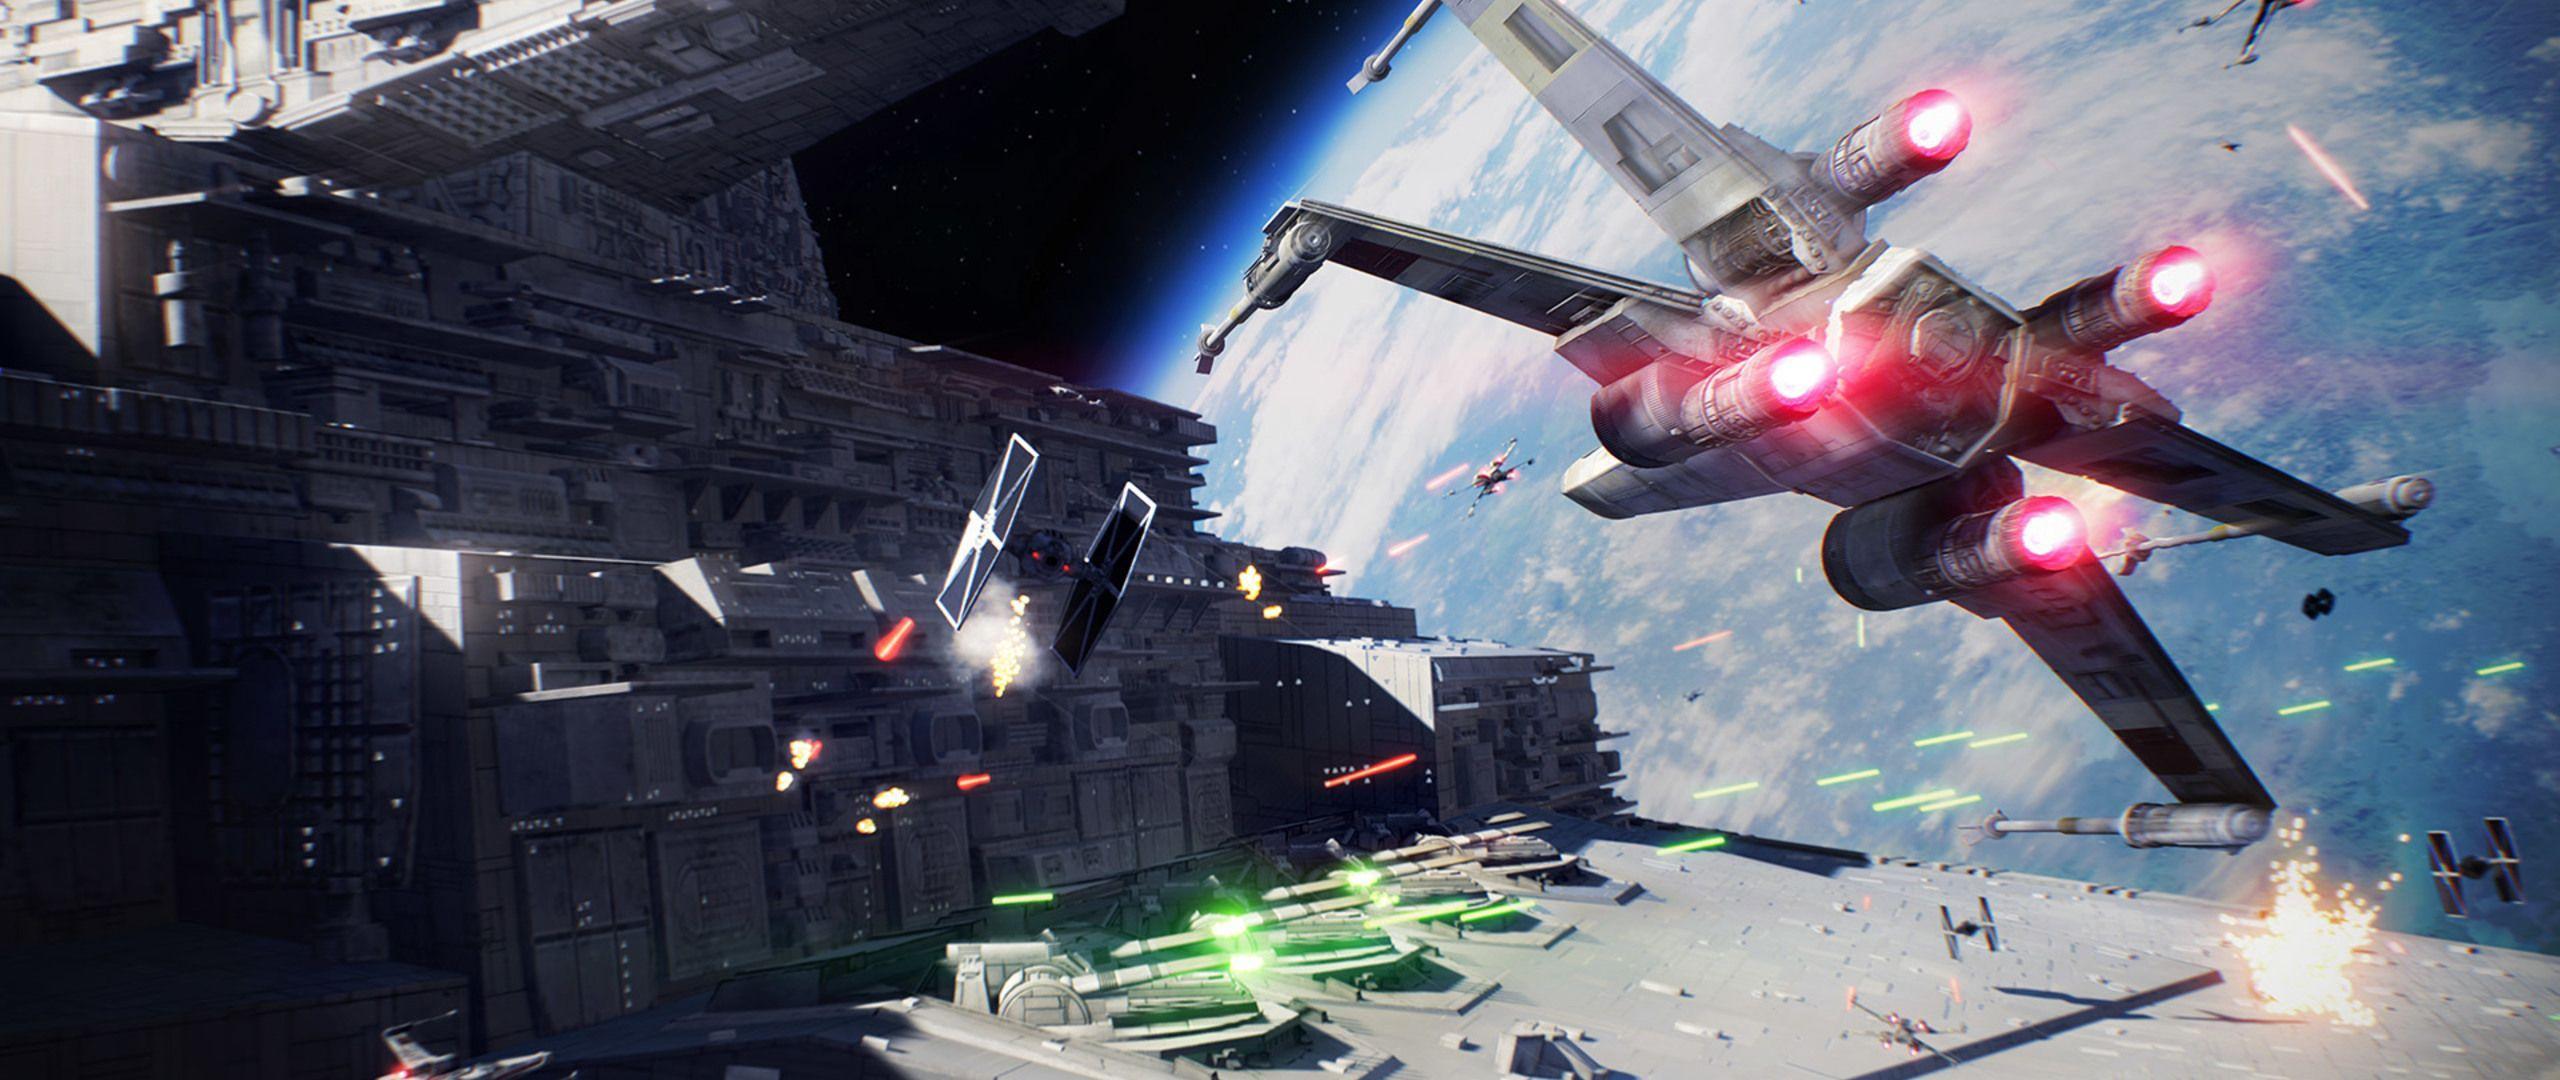 Star Wars Ultrawide Wallpapers Top Free Star Wars Ultrawide Backgrounds Wallpaperaccess